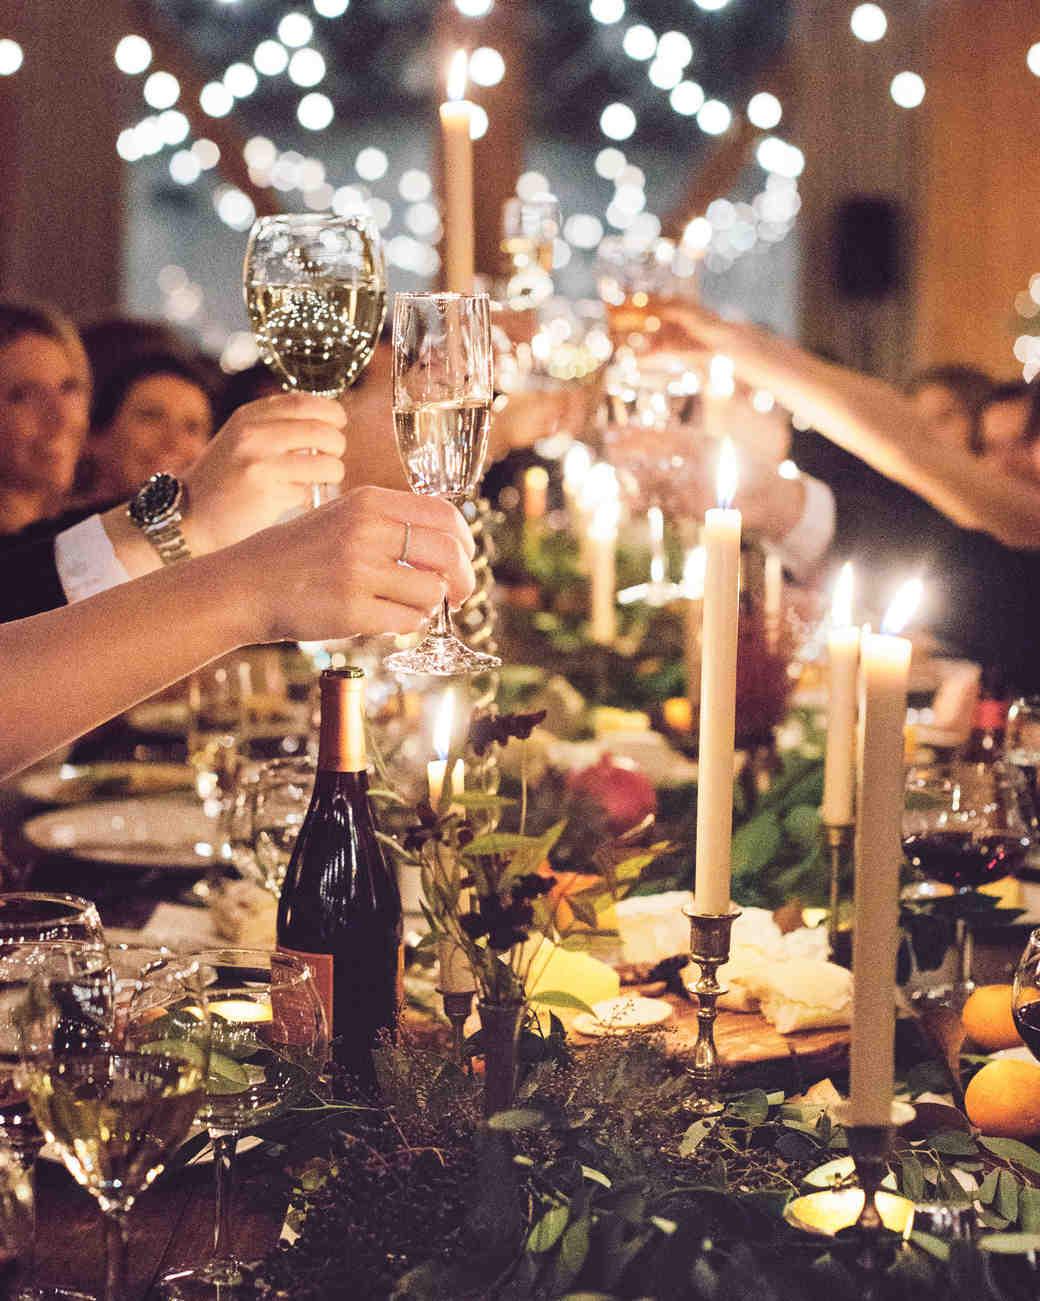 toast-wedding-candles-38a5233-ds111145.jpg